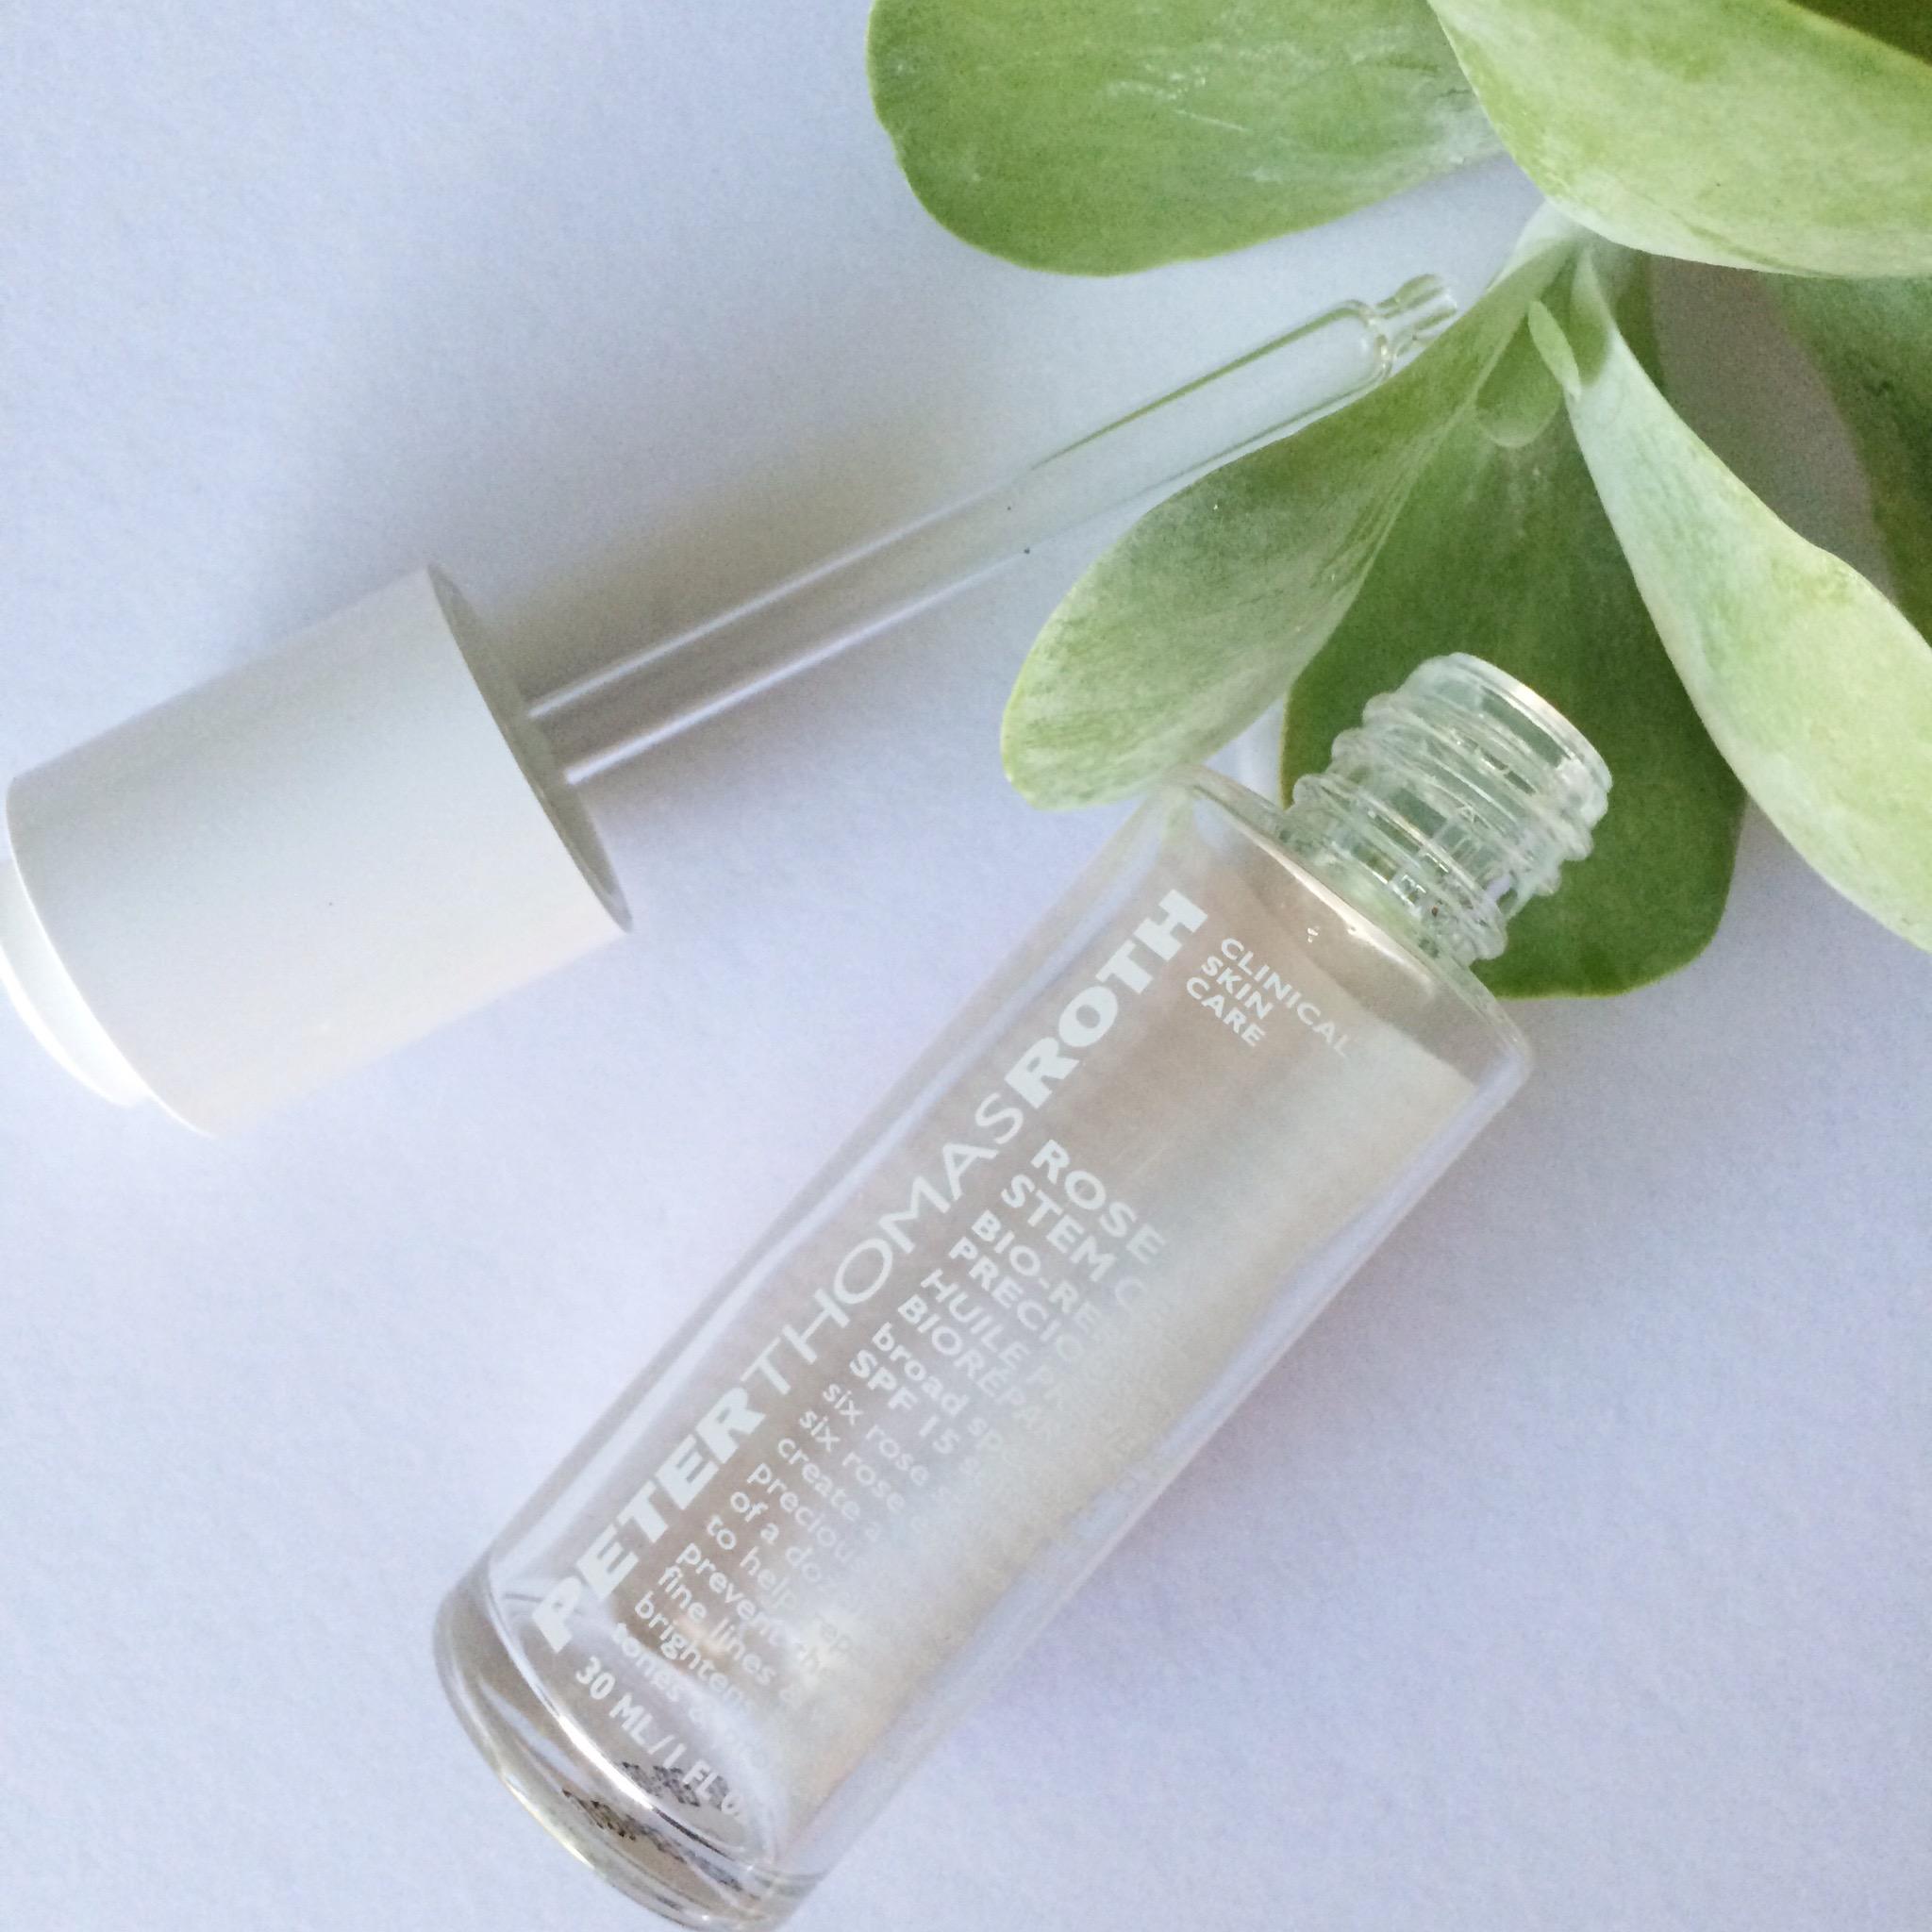 Keira Lennox Beauty Empties | Peter Thomas Roth Rose Stem Cell Bio-Repair Precious Oil SPF 15